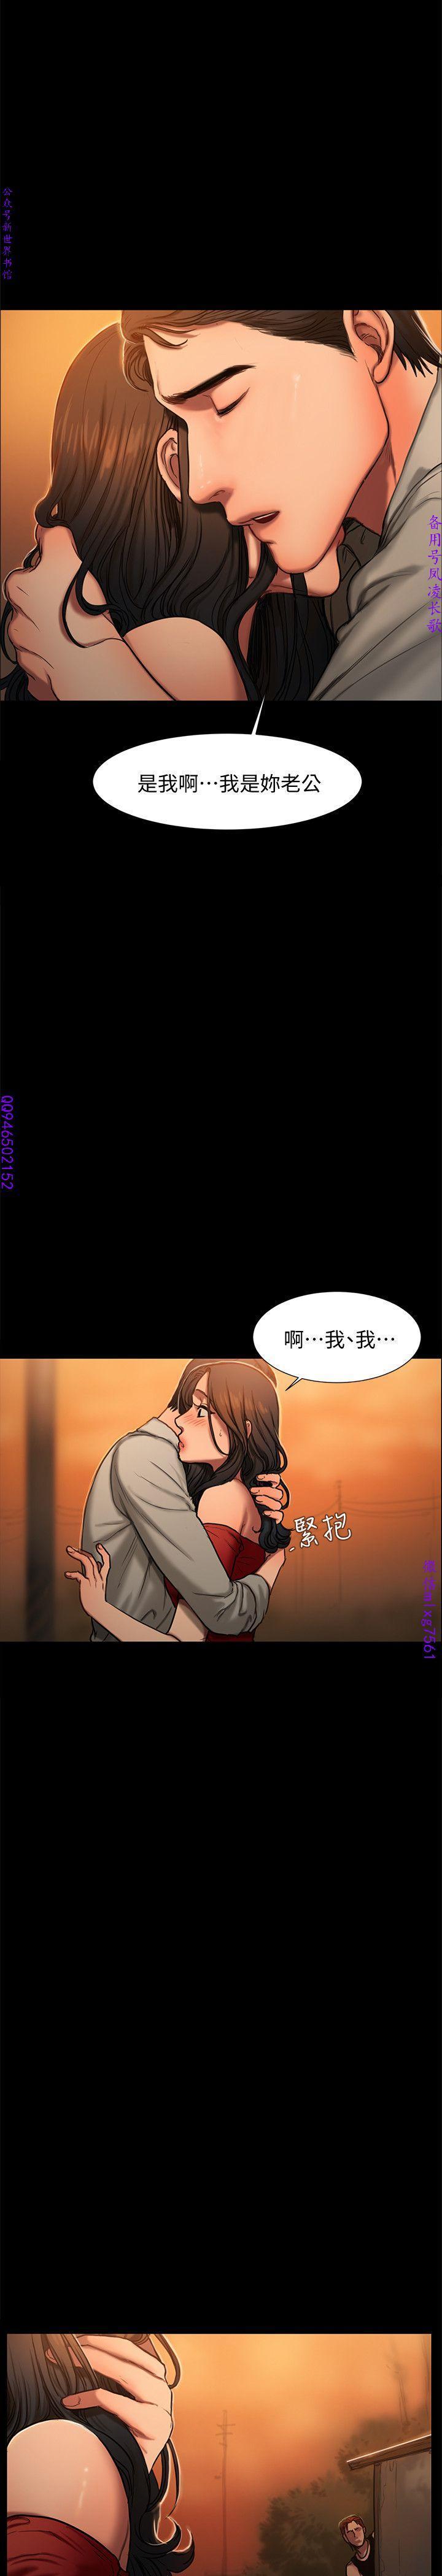 Run away 1-10【中文】 57